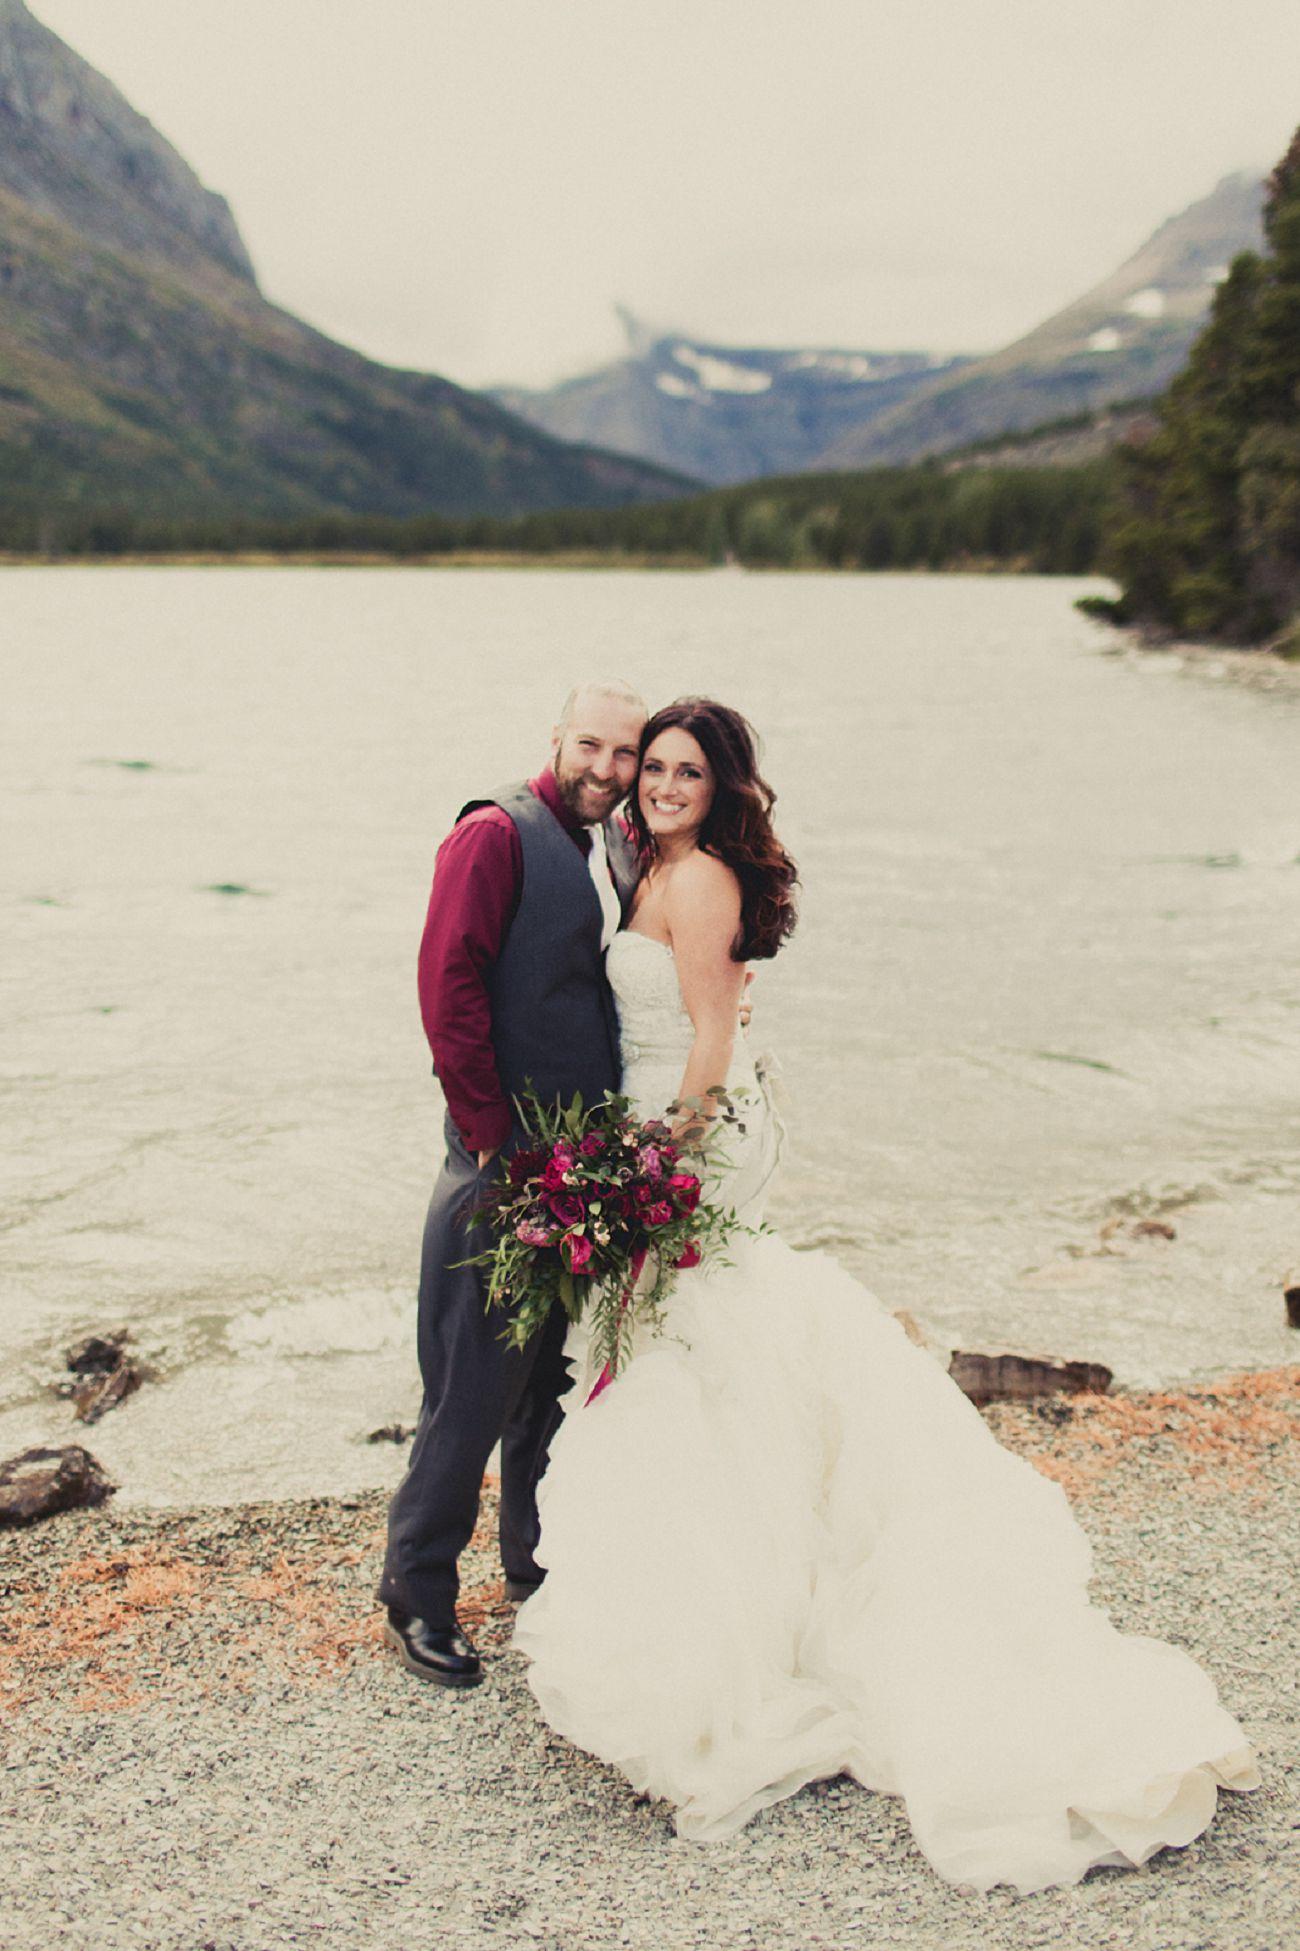 Jennifer_Mooney_Photo_Stone_wedding_00176.jpg